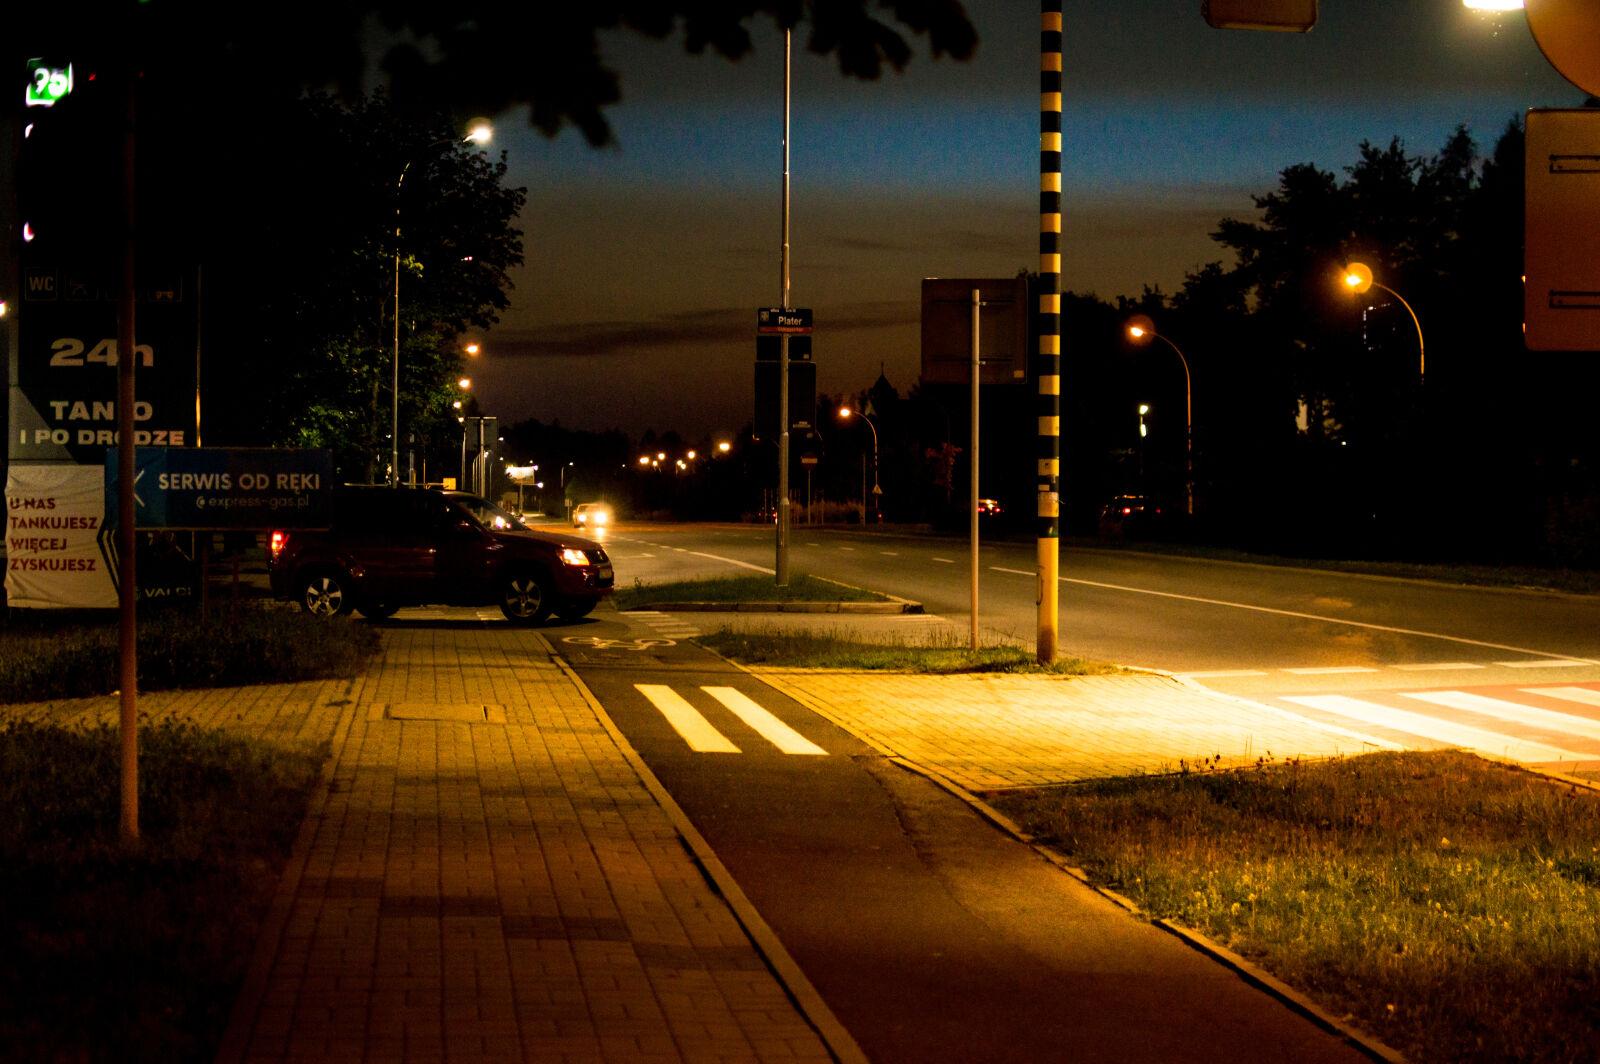 Nikon D3200 sample photo